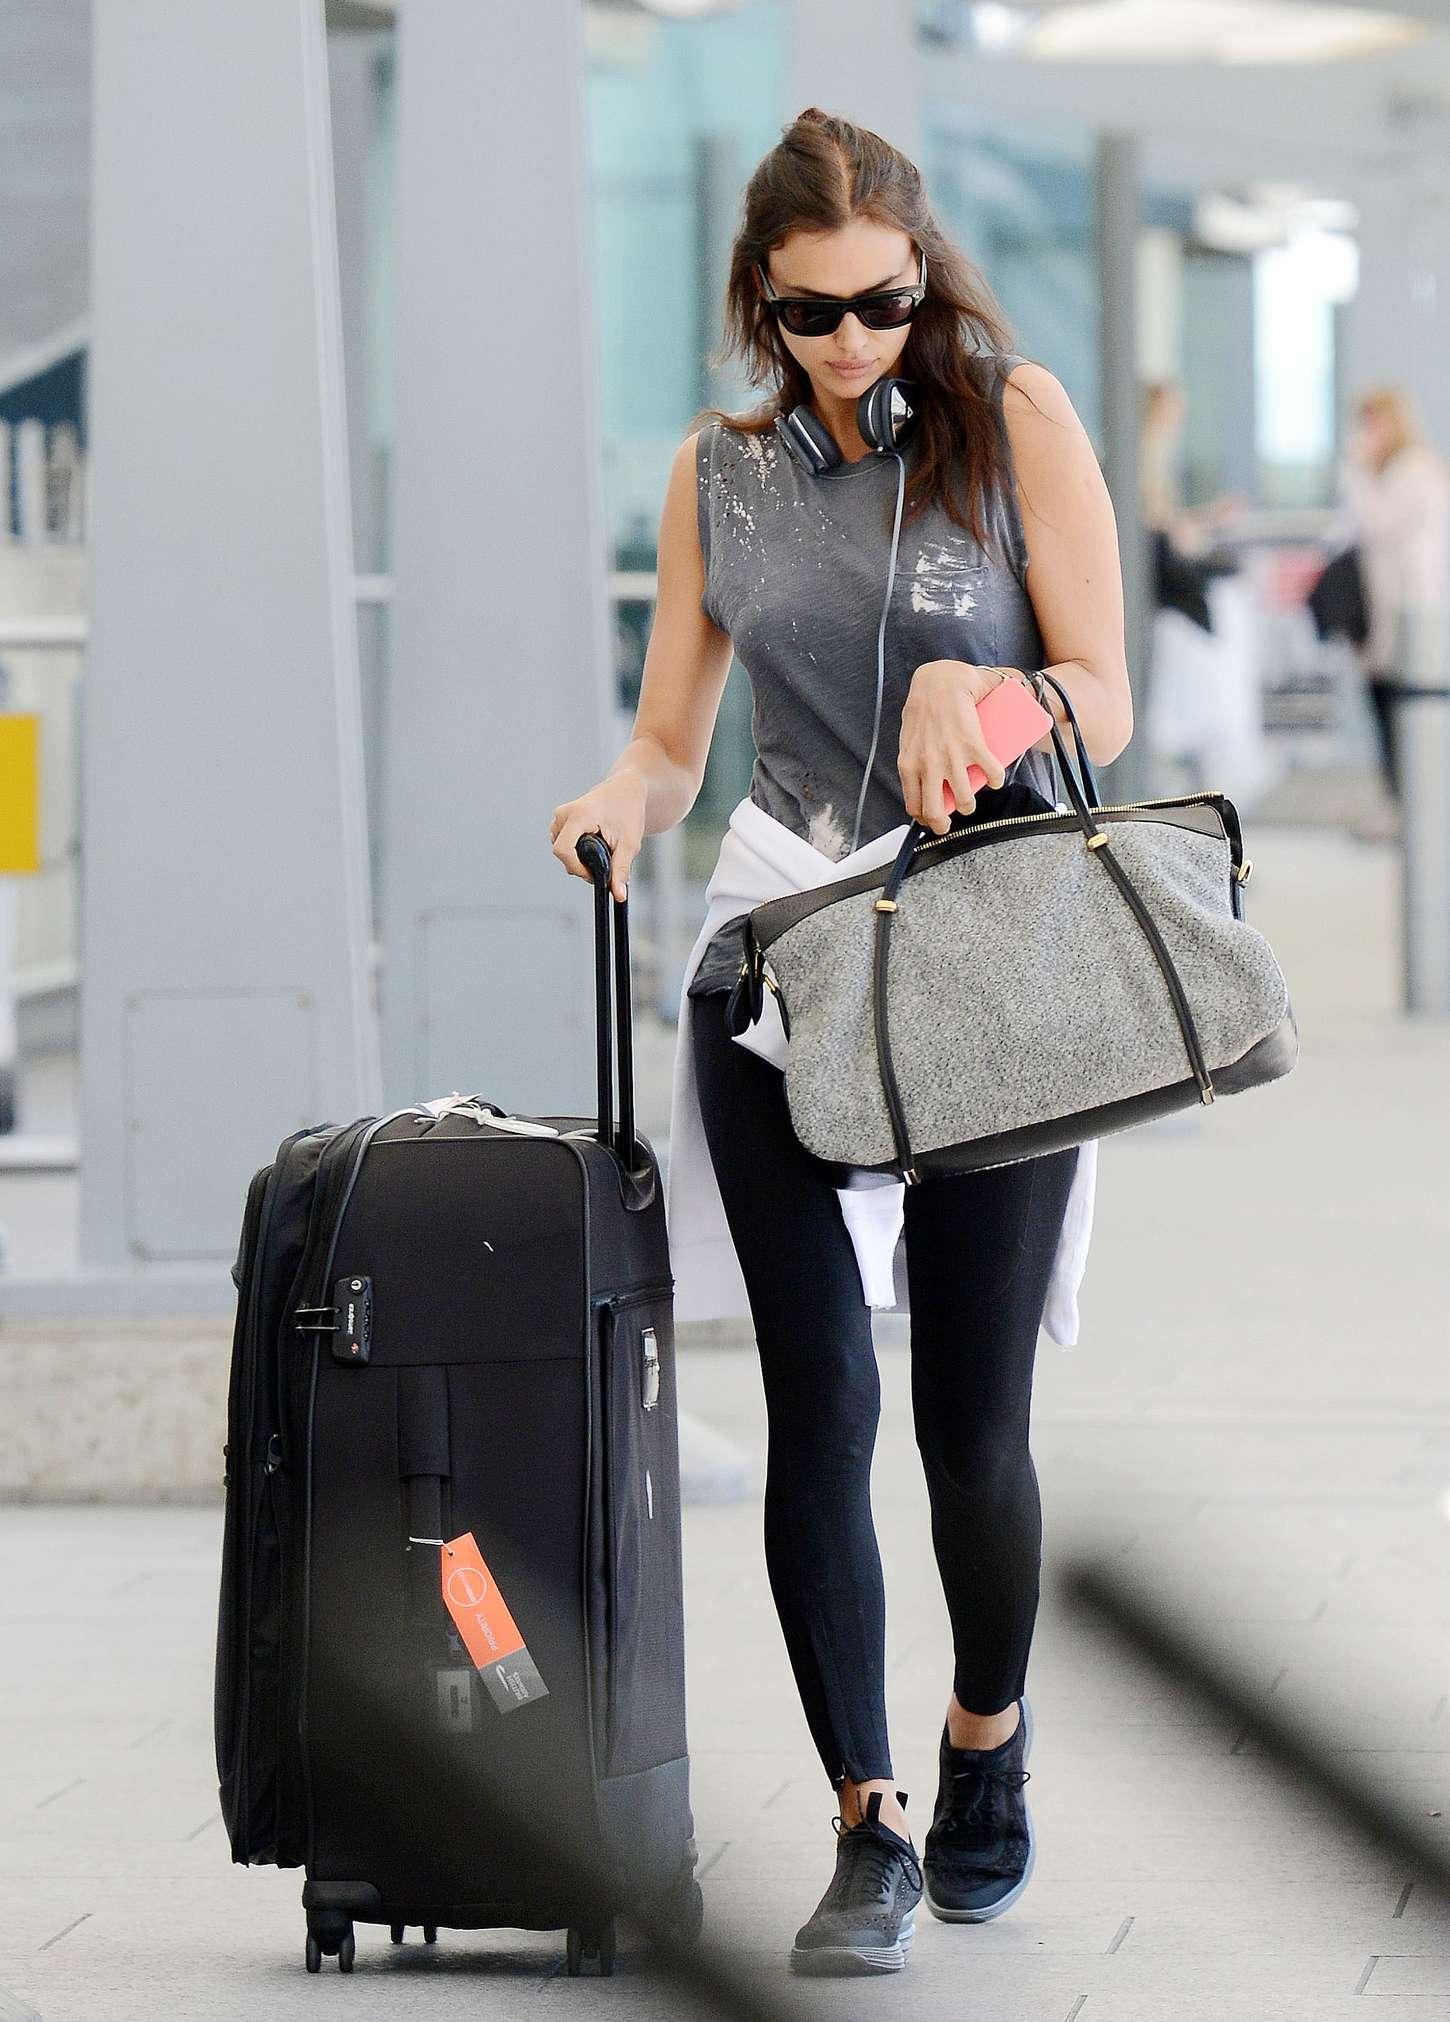 Irina Shayk 2015 : Irina Shayk in Leggings at Heathrow airport -10